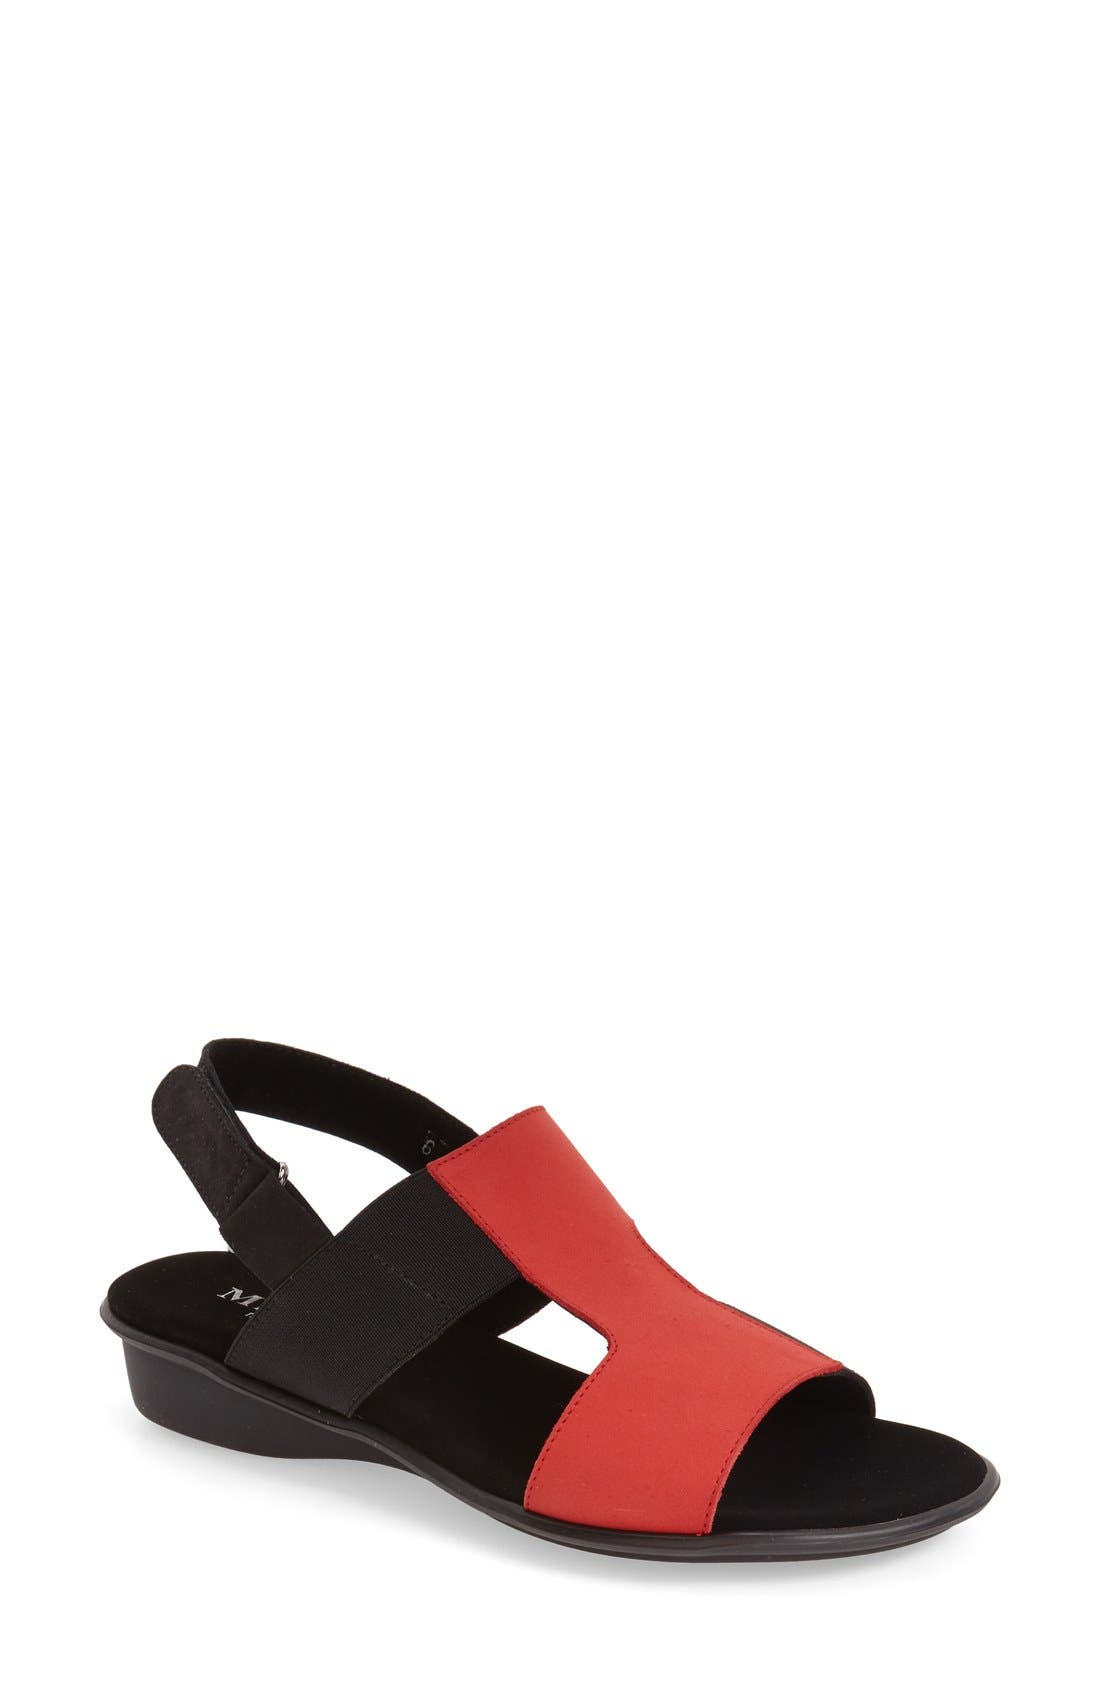 Alternate Image 1 Selected - Sesto Meucci 'Eudore' Slingback Sandal (Women)